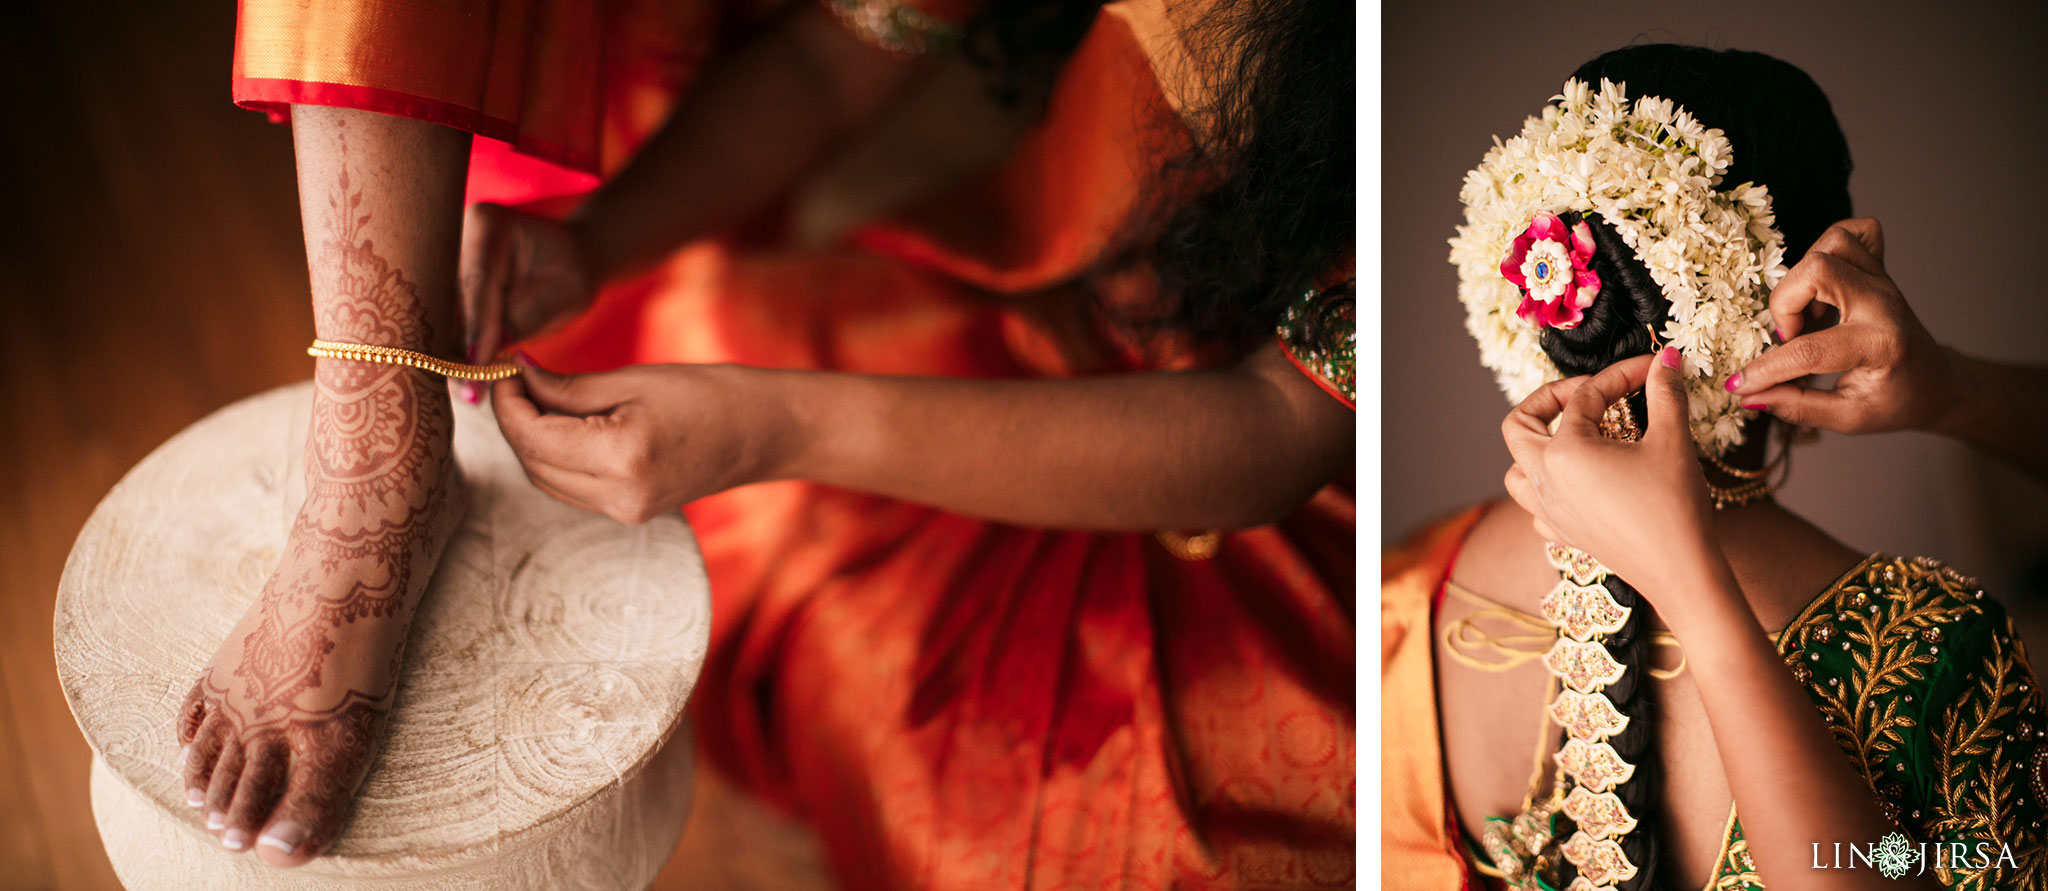 zjl monarch beach resort orange county indian wedding photography